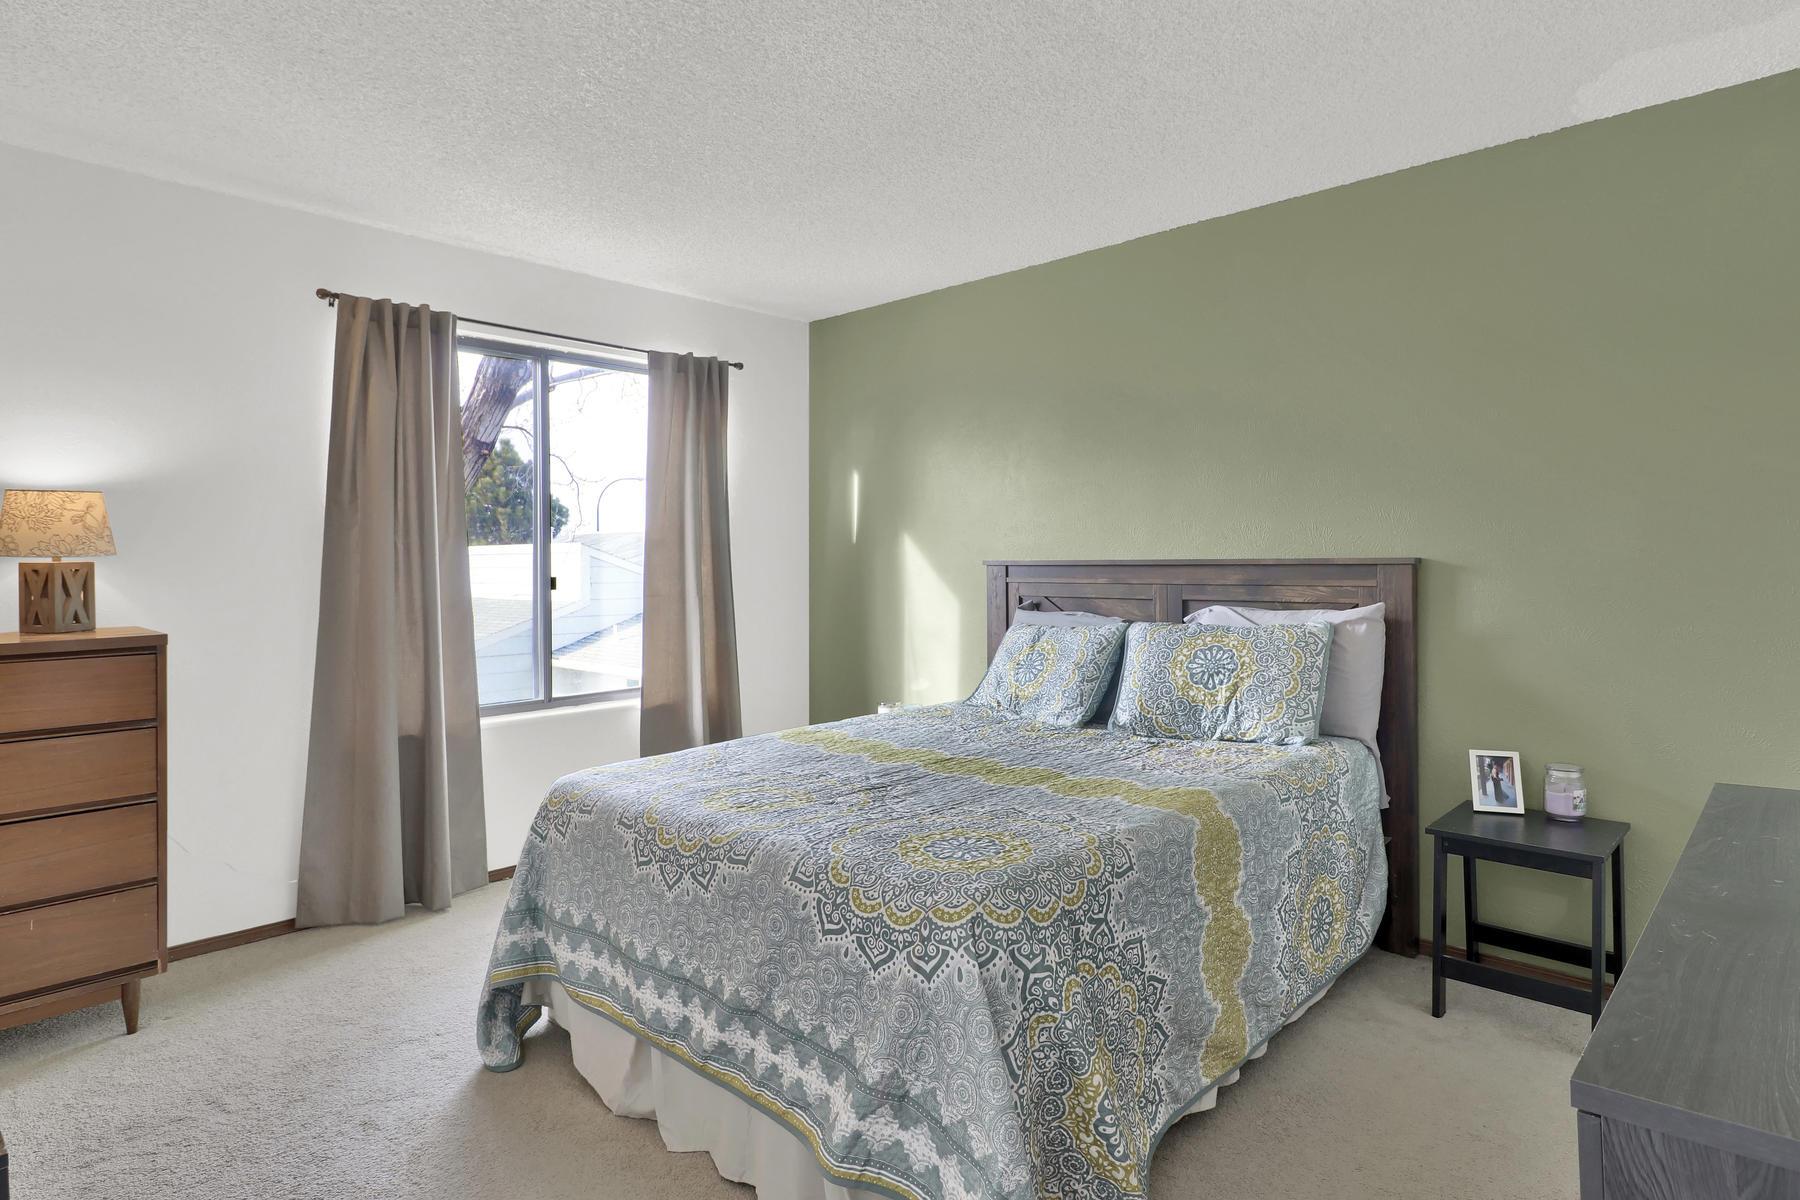 990 W 133rd Cir E Westminster-017-18-Bedroom-MLS_Size.jpg